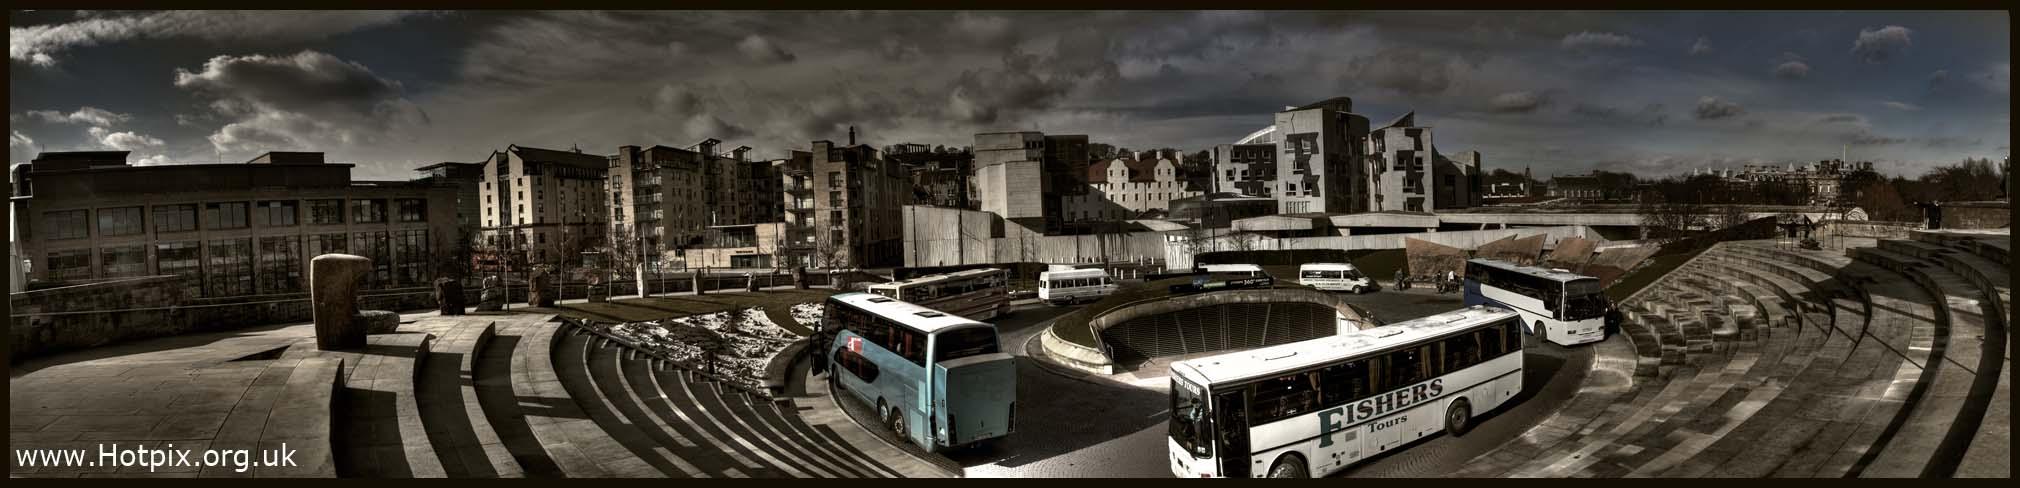 dynamic,earth,our,holyrood,edinburgh,city,capital,scotland,pano,panorama,stitched,sticher,wide,shot,scots,scottish,parliament,royal,mile,sepia,selective,colour,black,white,b/w,colores,color,blanco,negra,tonysmith,tony,smith,Panoramique,int\u00e9ressant,join,joiner,stitch,stitcher,autostitch,auto,building,buildings,built,architecture,imagen,panor\u00e1mica,image,panoramisches,Bild,selectivo,couleur,s\u00e9lective,vorgew\u00e4hlte,Farbe,angle,wideangle,lens,sigma,12-24mm,10-20mm,hotpicks,hotpix,hotpics,hot,pix,pics,uk,edinbrugh,Edinburg,#tonysmithhotpix,edimburgh